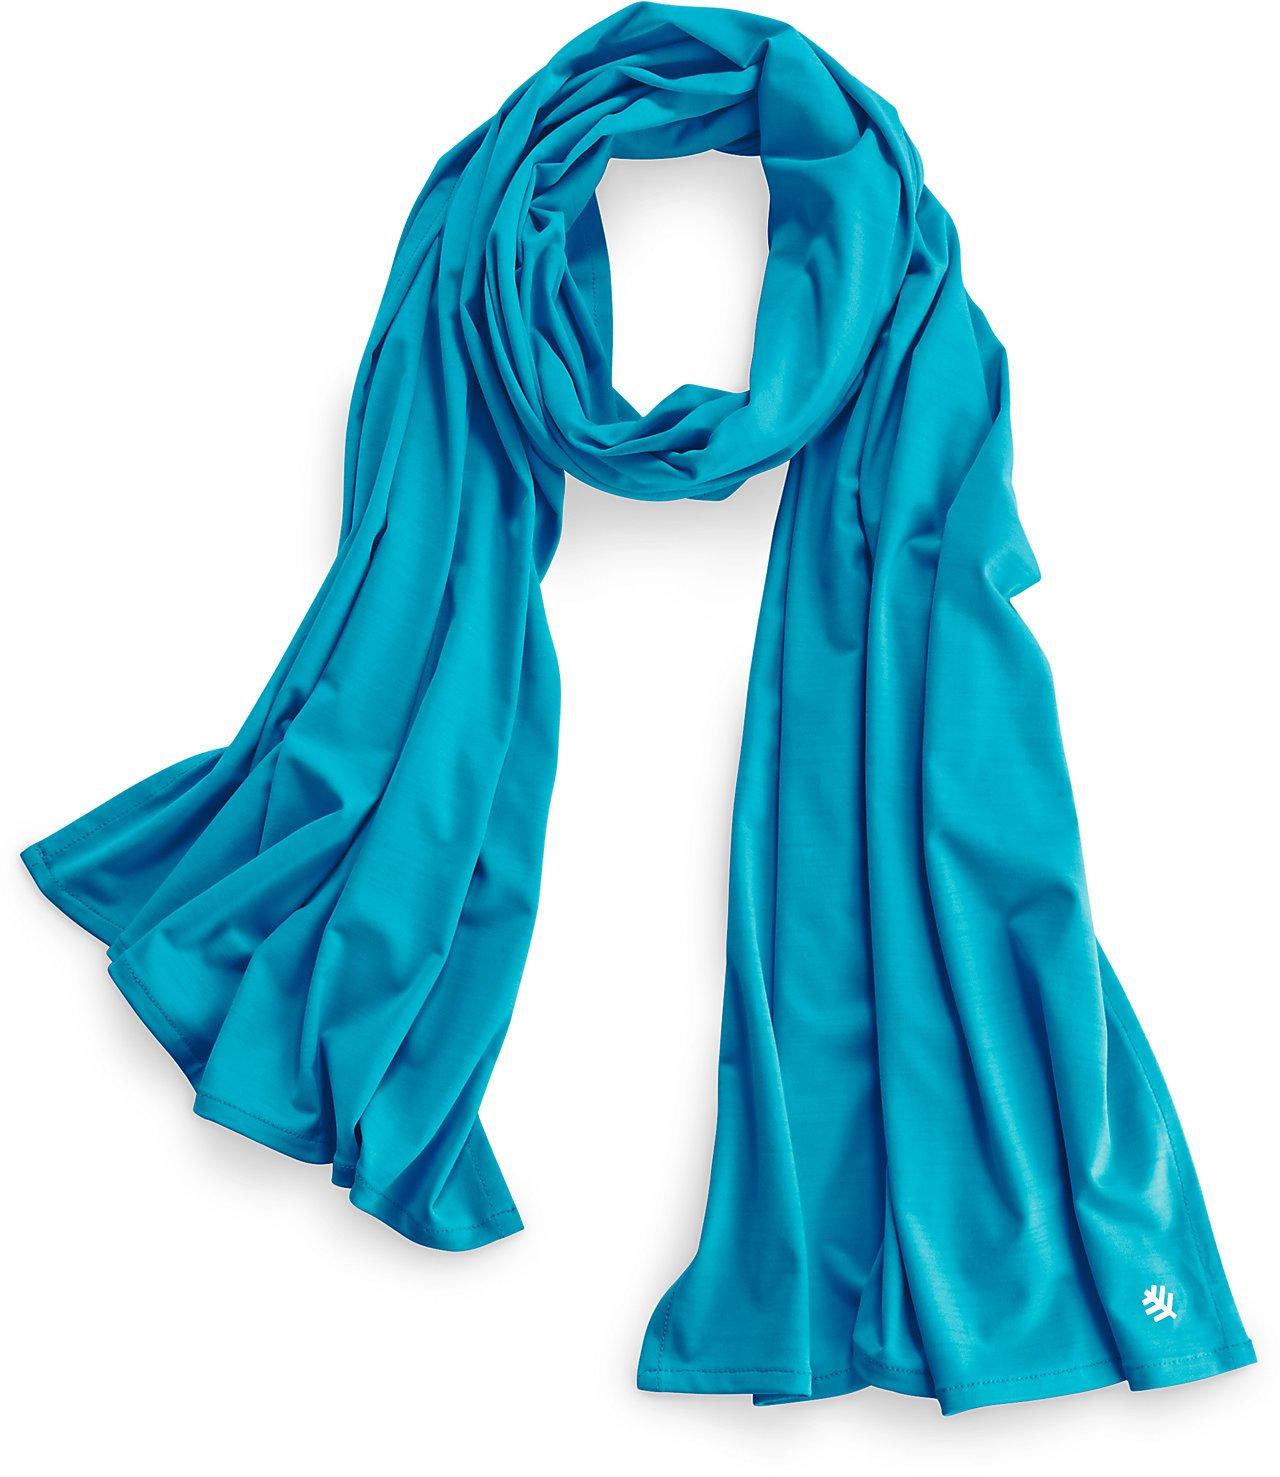 Coolibar UPF 50+ Women's Performance Sun Shawl - Sun Protective (One Size- Blue Turquoise)